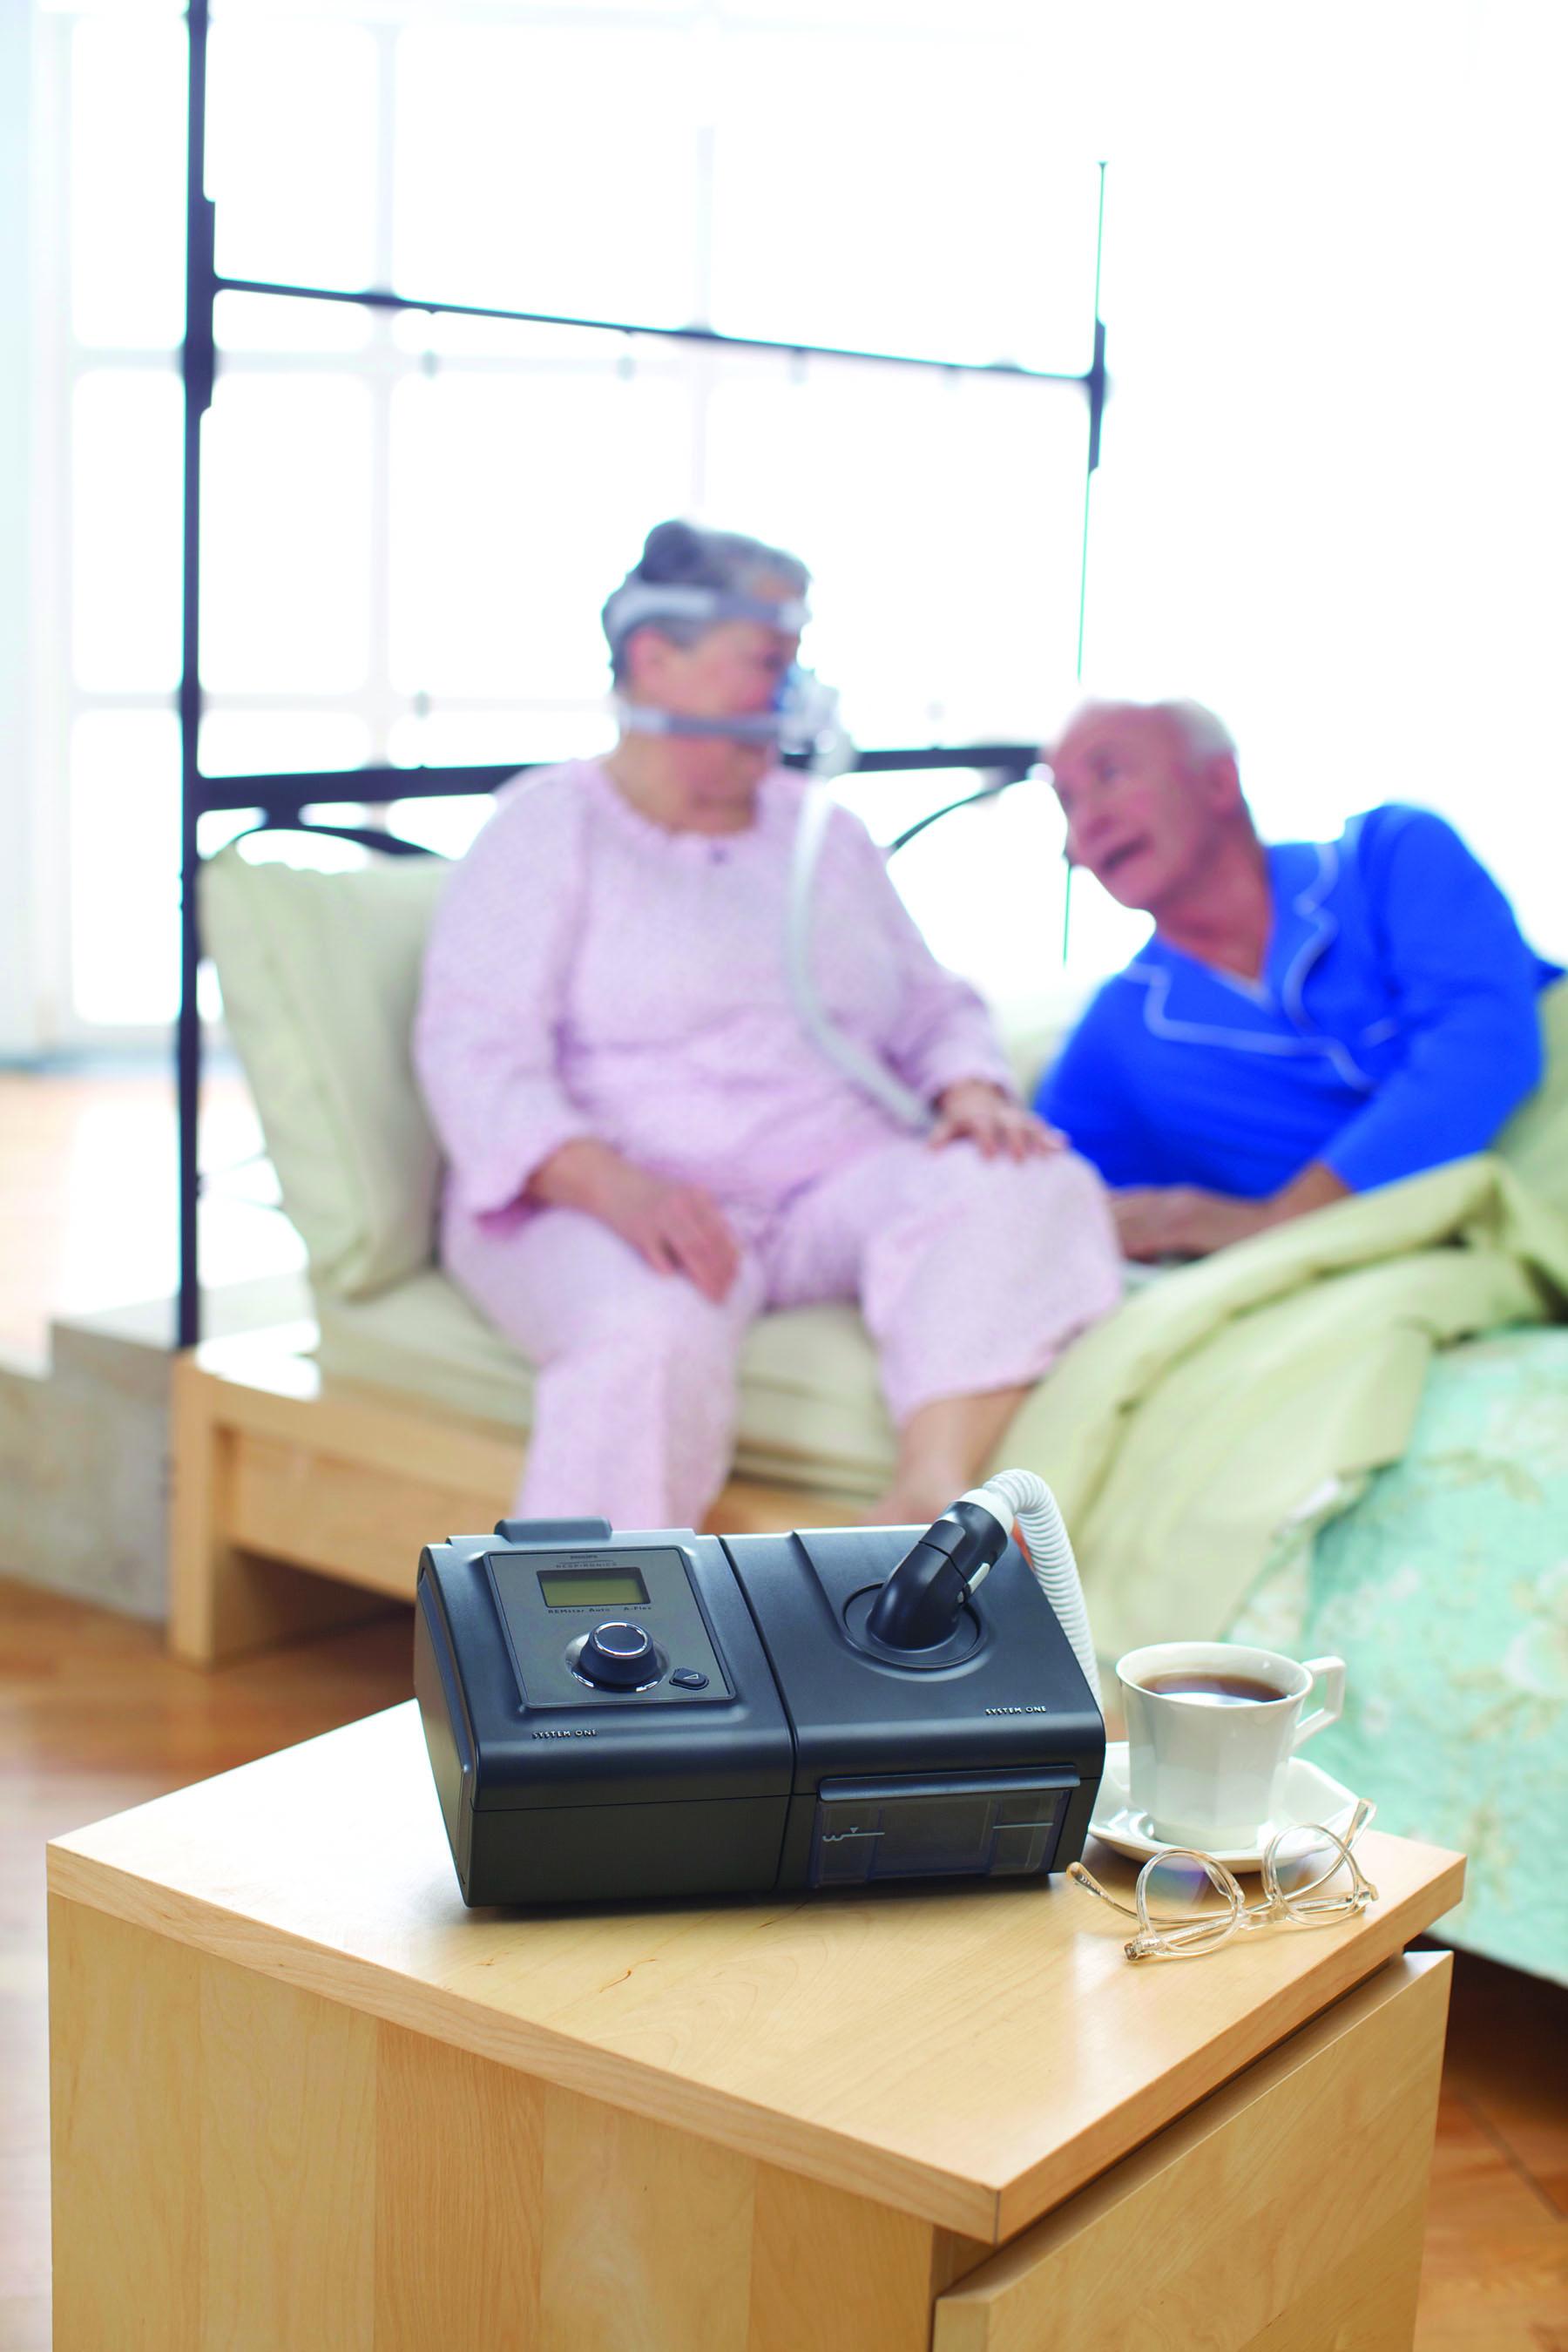 HeatedTubeInUse Bed high CPAP America #8E6C3D